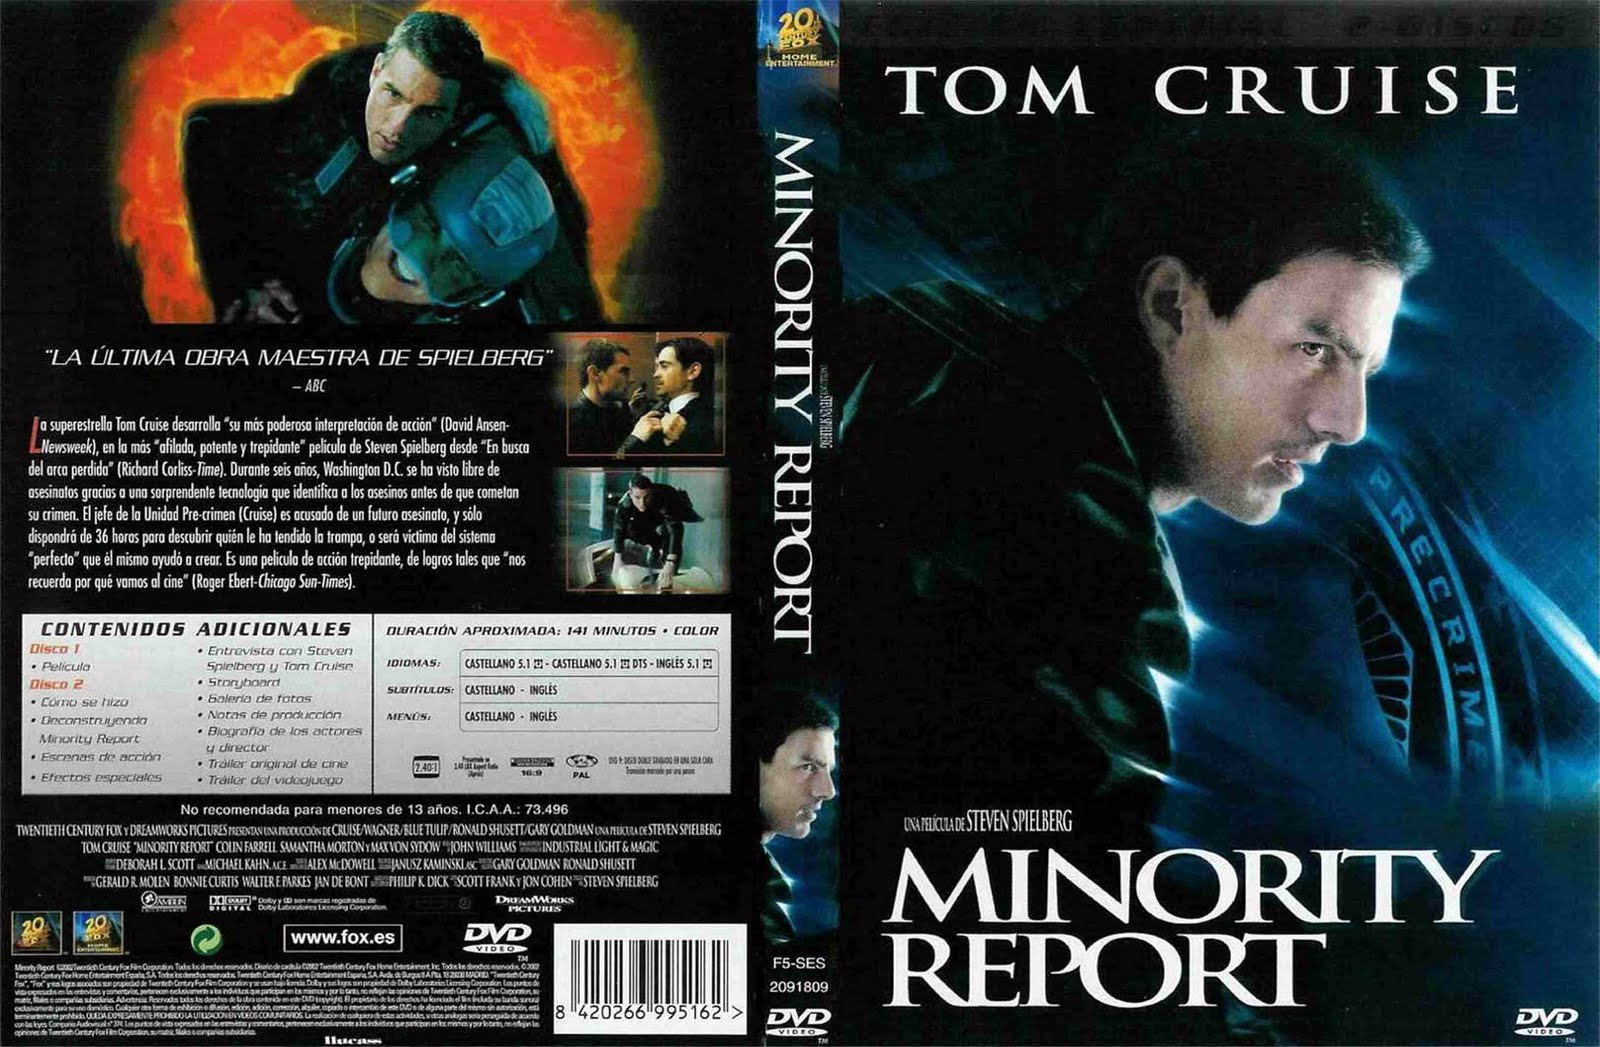 http://2.bp.blogspot.com/-64o5GPK5djE/Tml7YGm8nFI/AAAAAAAAACw/T7KhfUhlka0/s1600/Minority-Report-Frontal-DVD.jpg